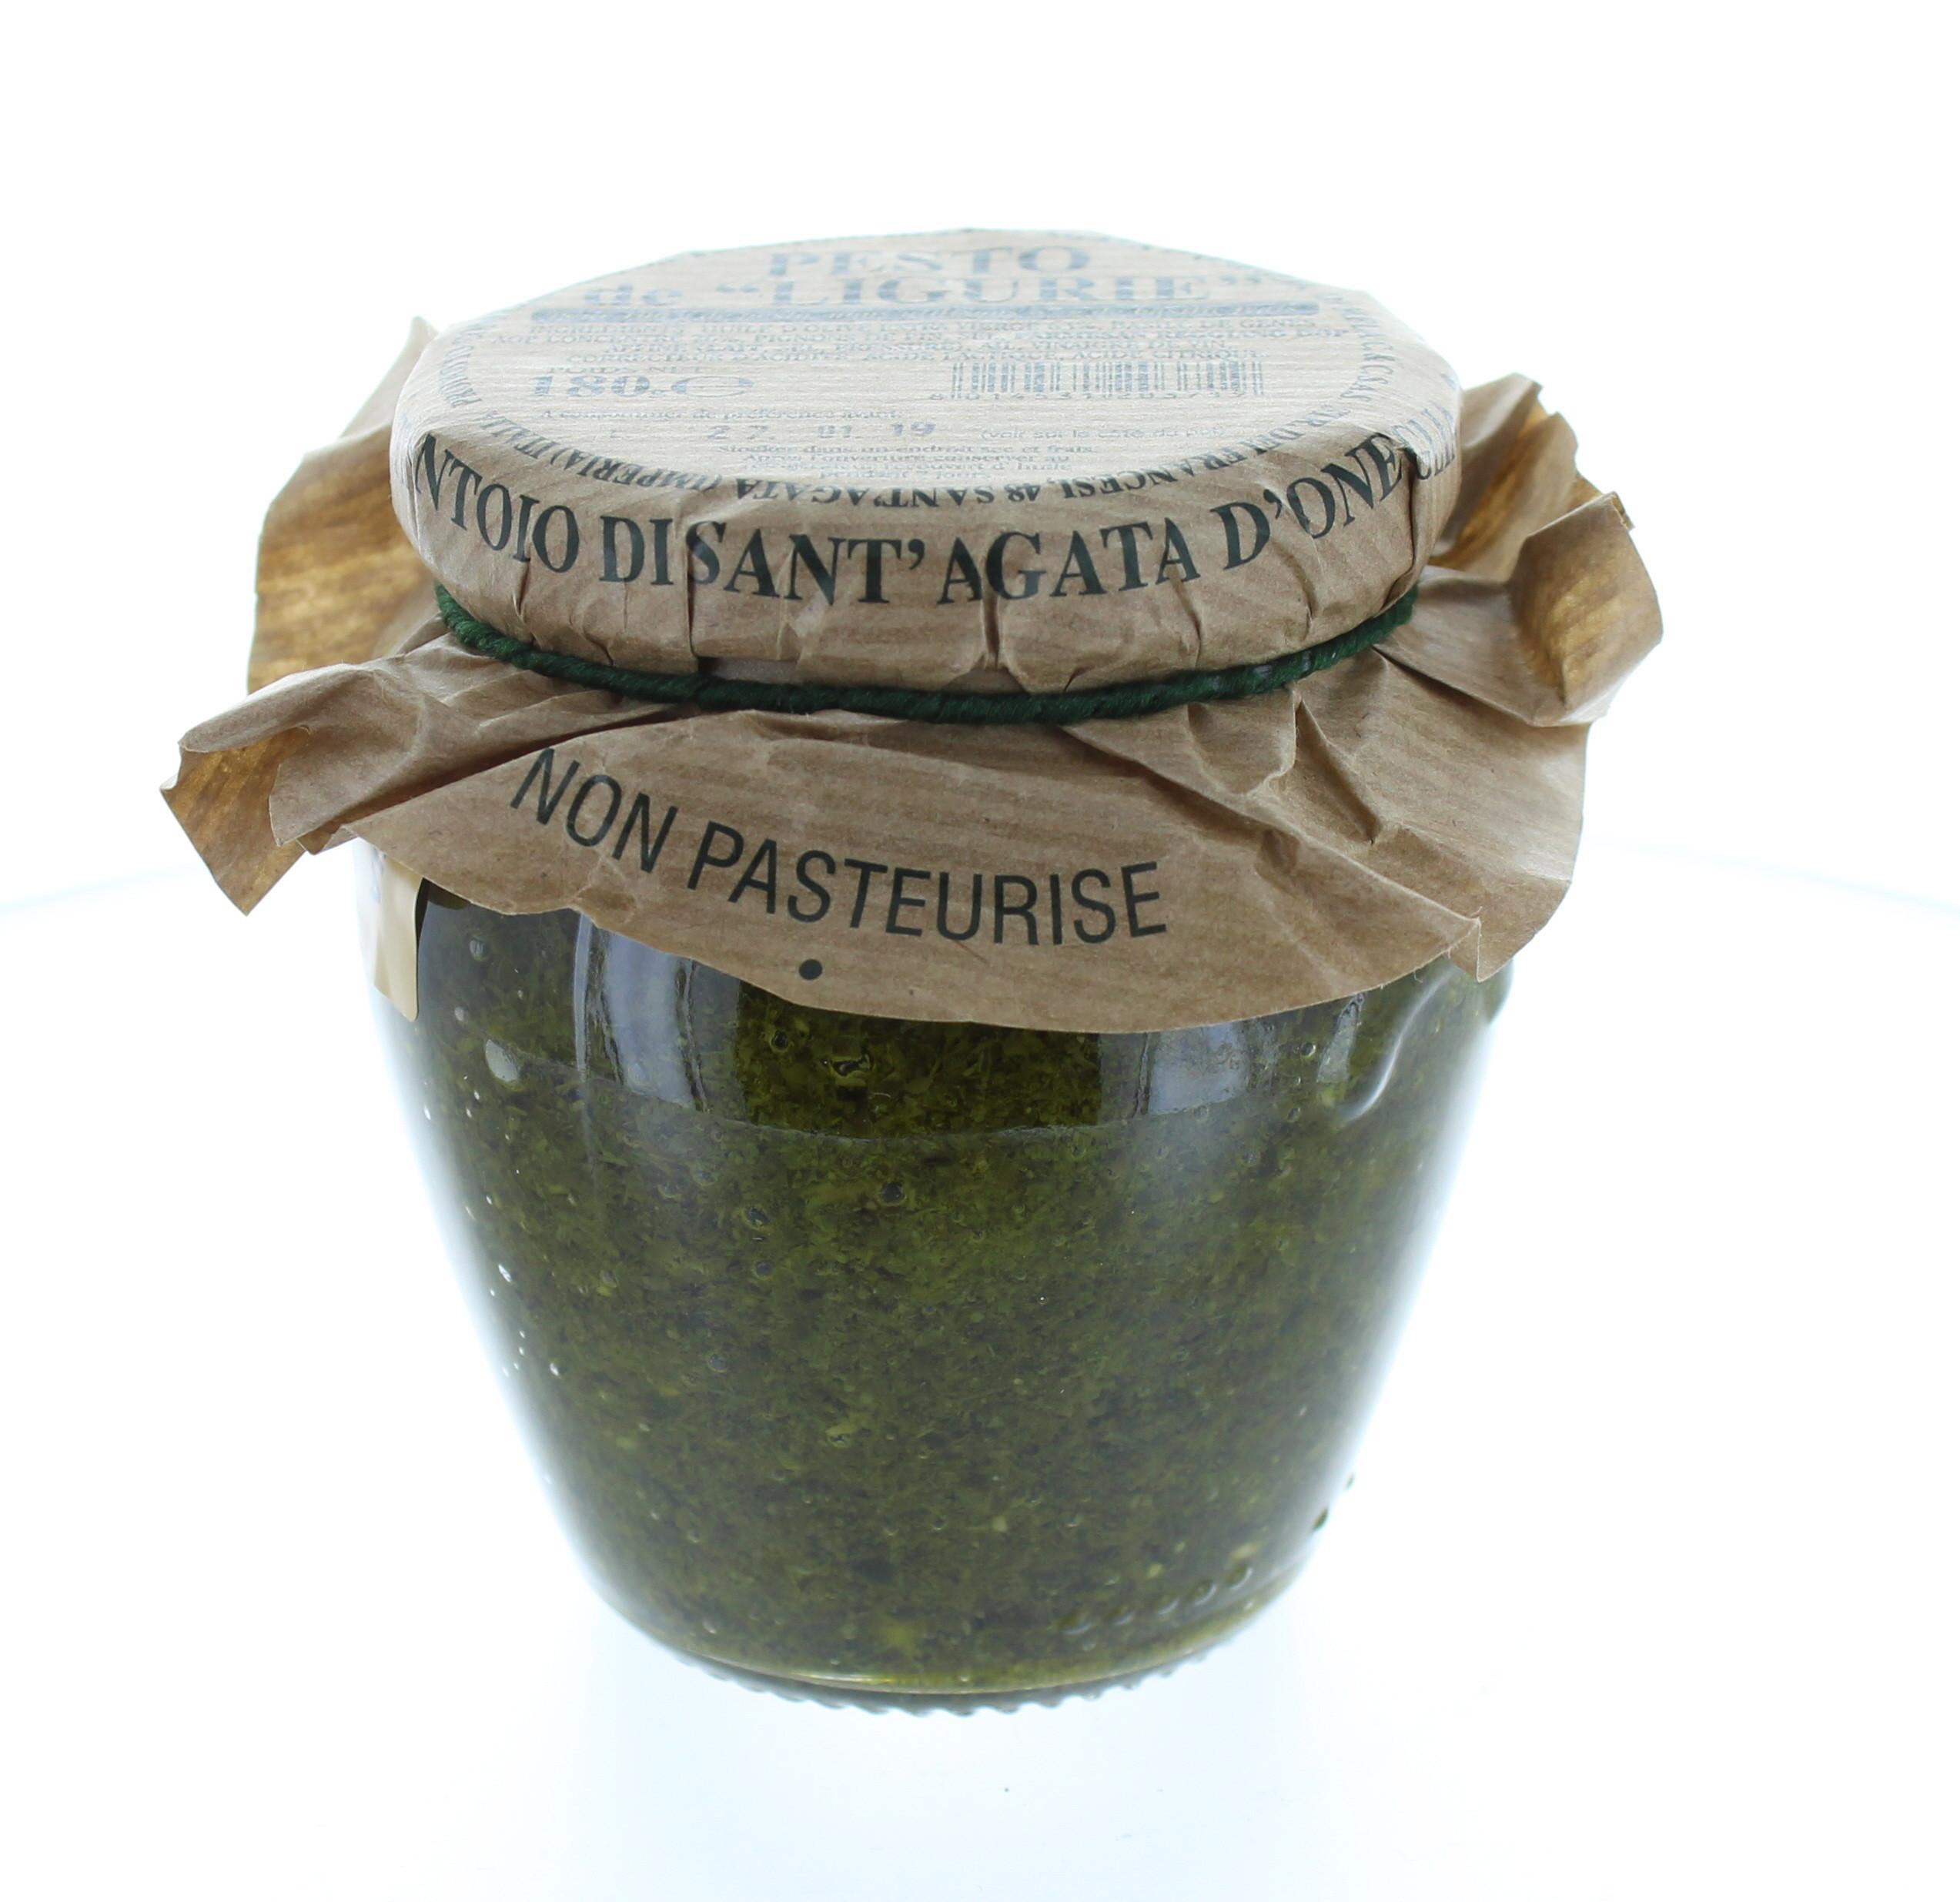 Pesto au basilic - Regal des Sens